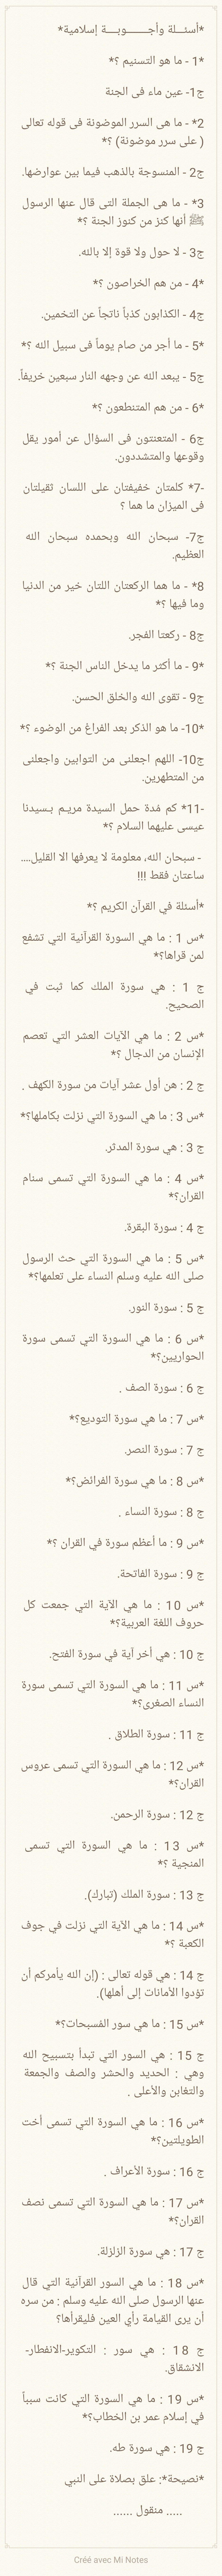 Pin By Amamne Najia On Islamyates Sheet Music